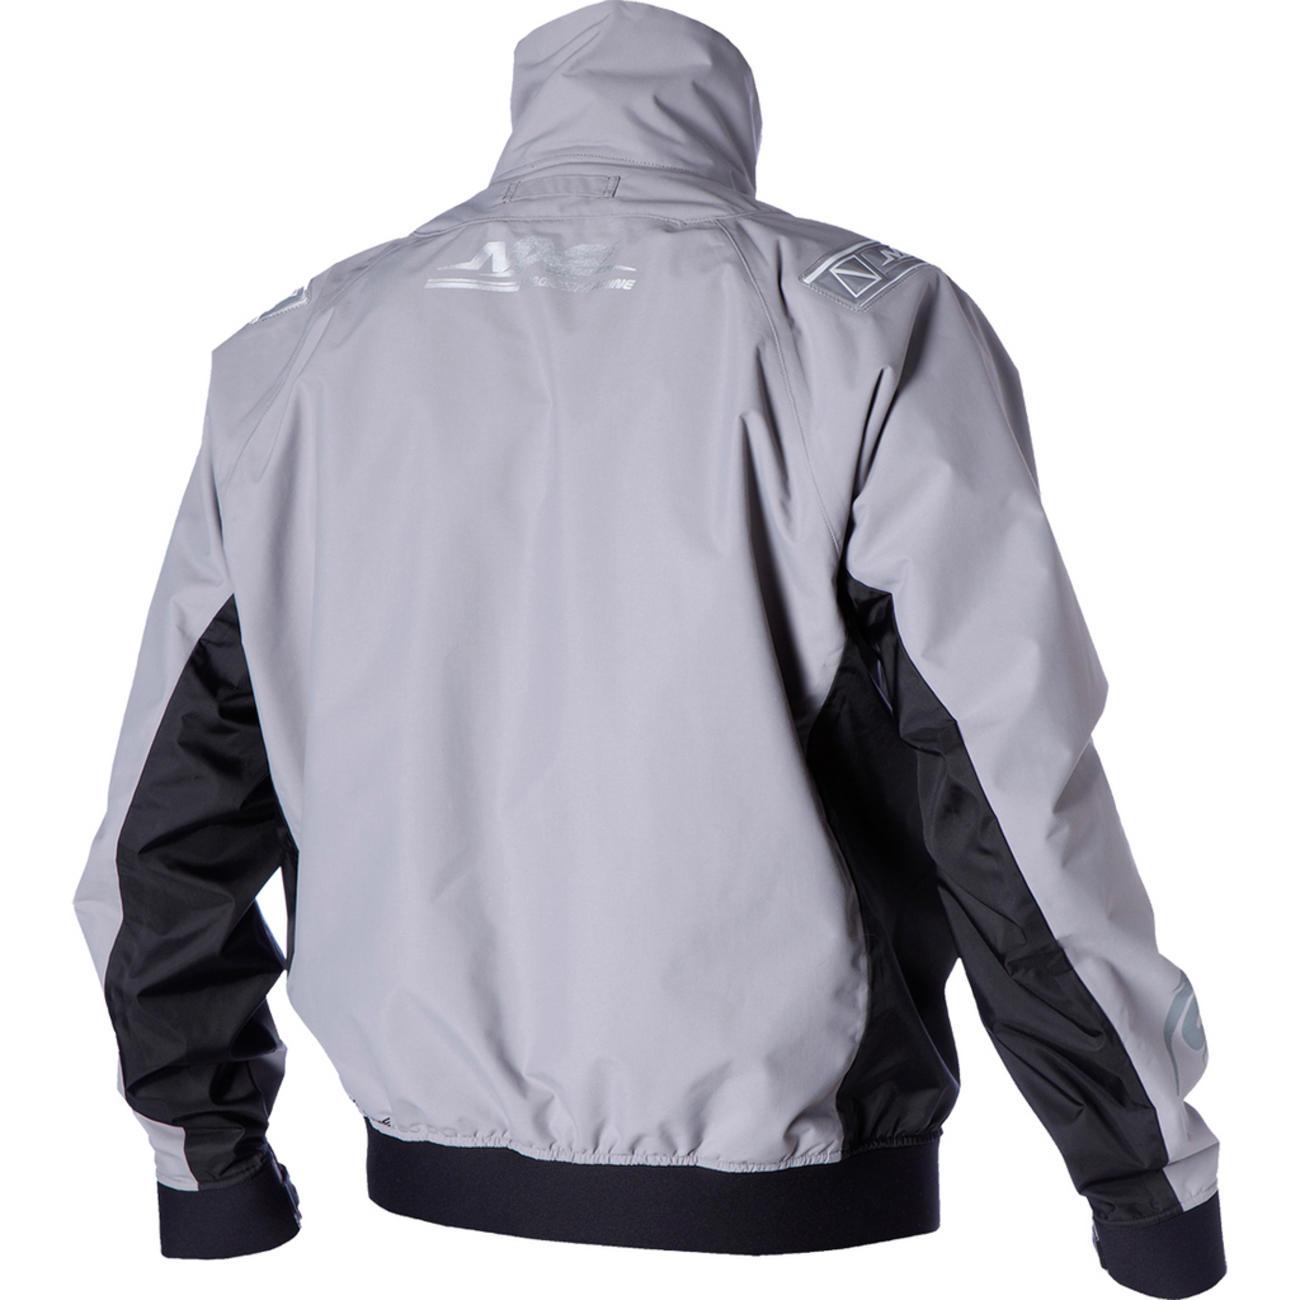 F-ZIP SPRAYTOP 2L 2レイヤーパドリングジャケット